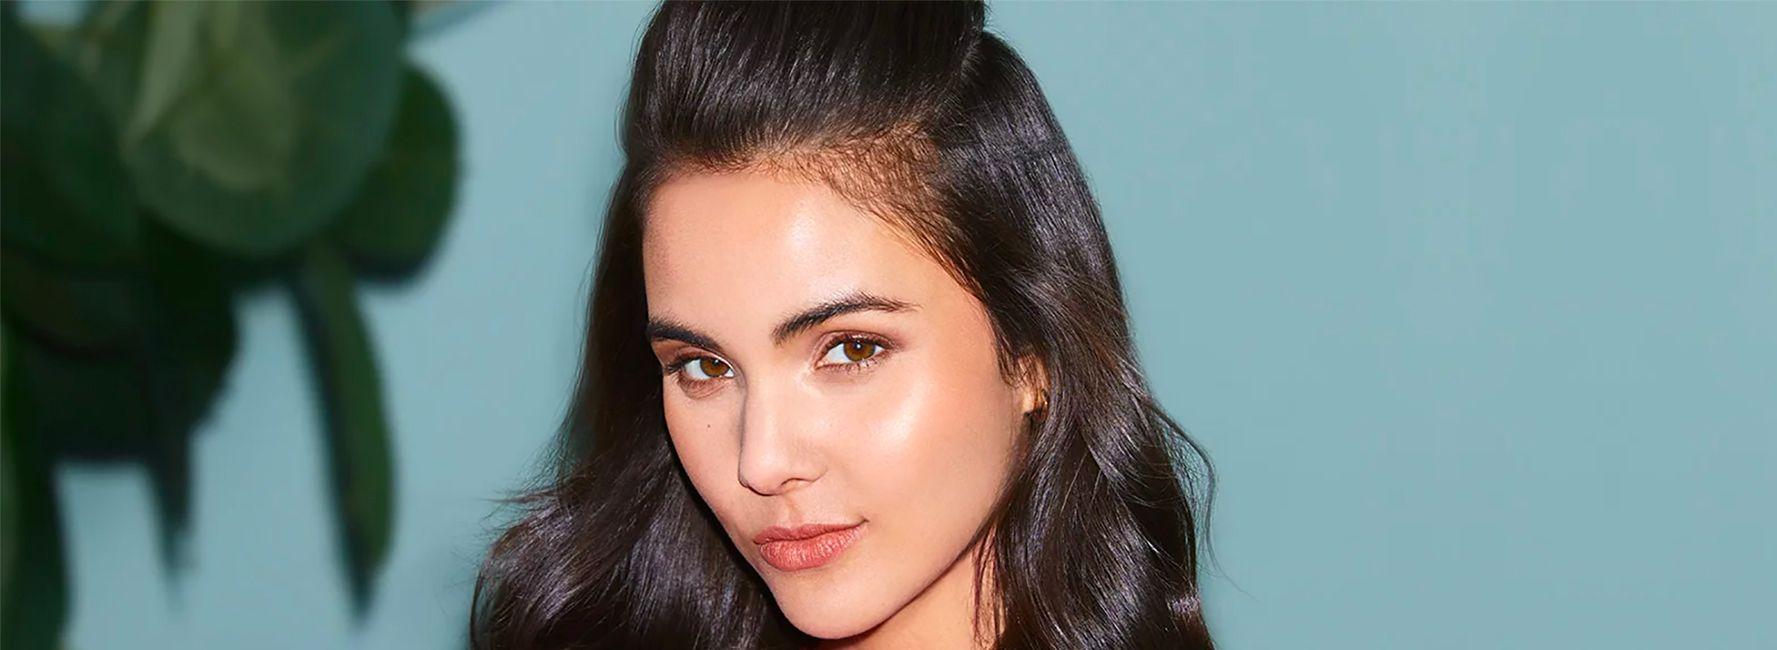 Woman with dark half ponytail hairstyle